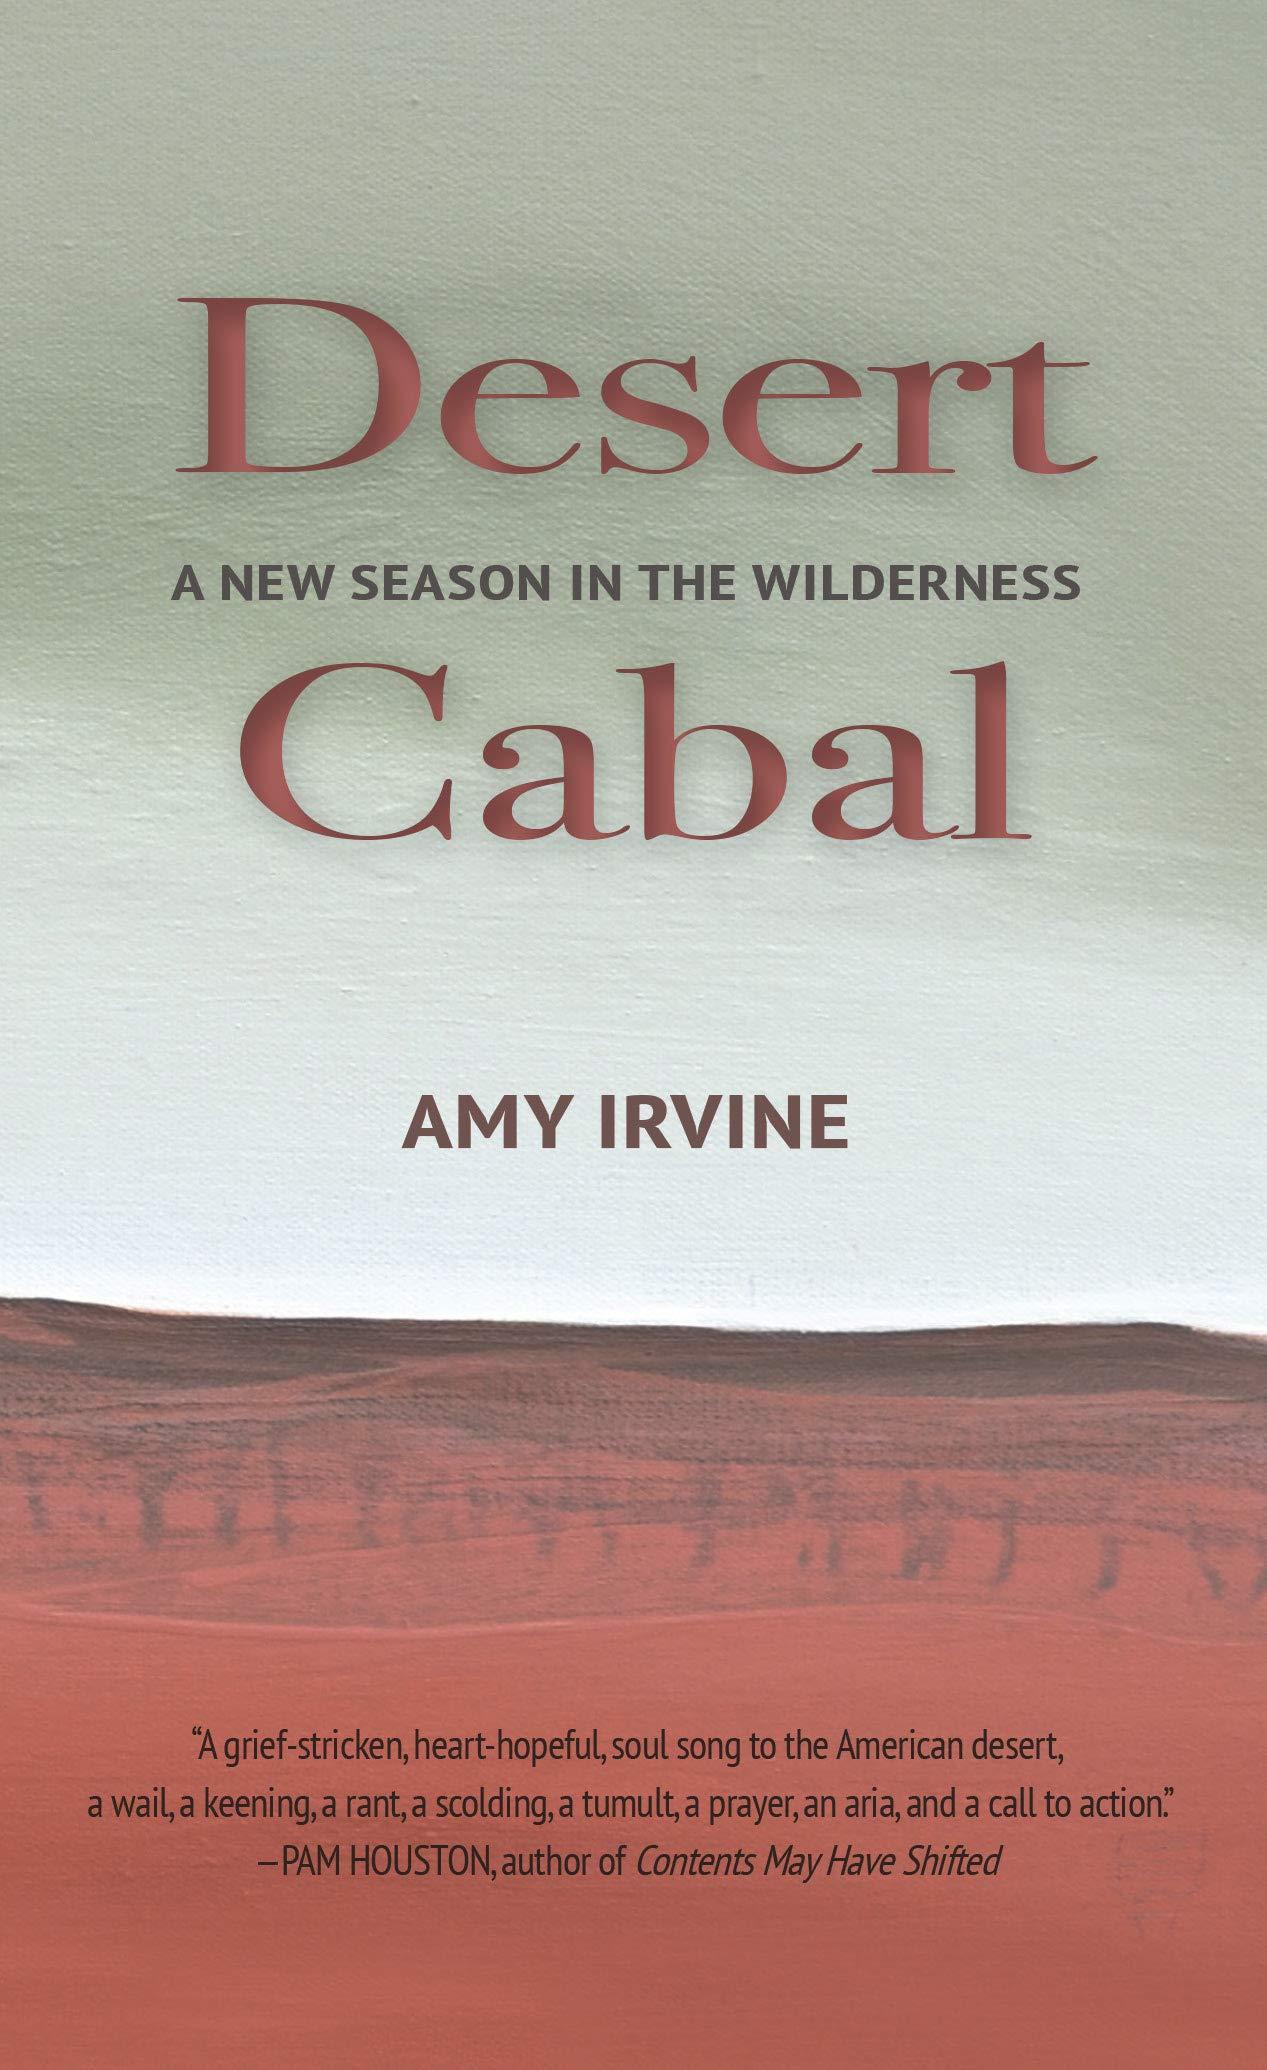 The Lake Season A Novel Wiring Library Toshiba T300mvi Diagrams Amazoncom Desert Cabal New In Wilderness 9781937226978